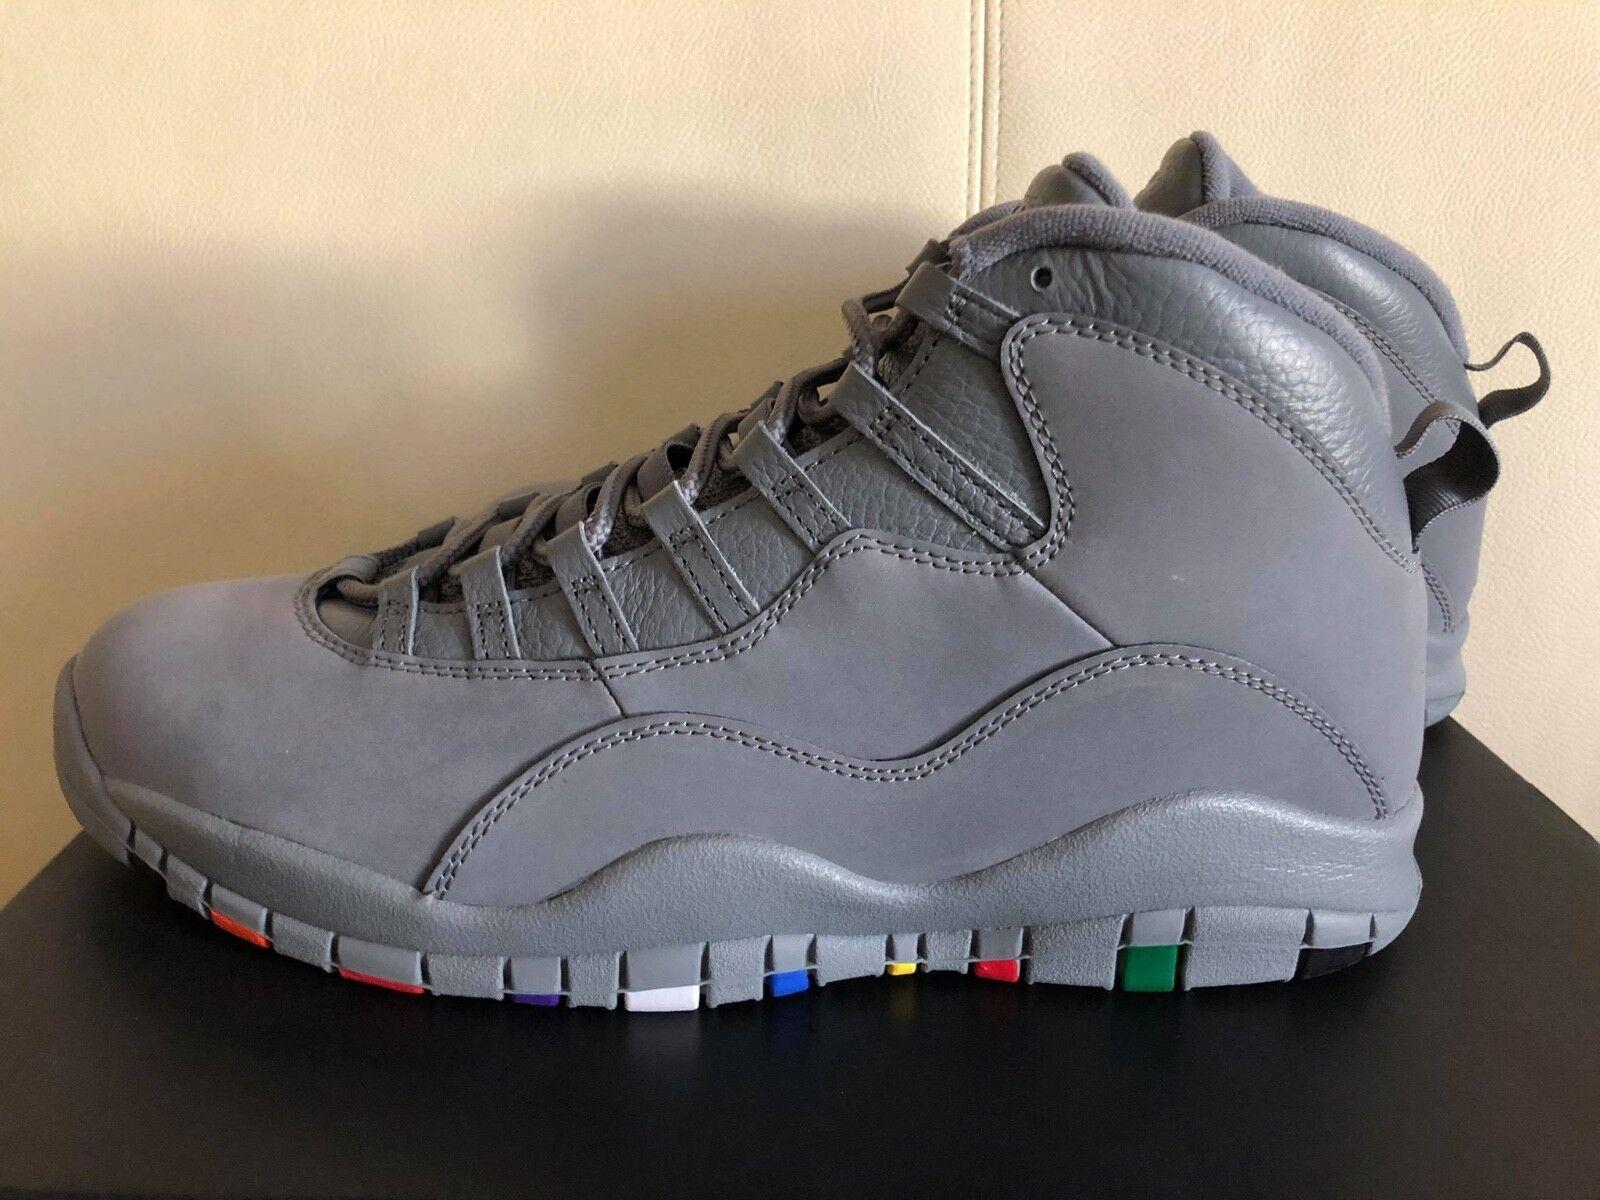 Jordan 10 retro fresco Air gris 310805-022 para hombre X baloncesto Calzado Tenis Nuevo En Caja